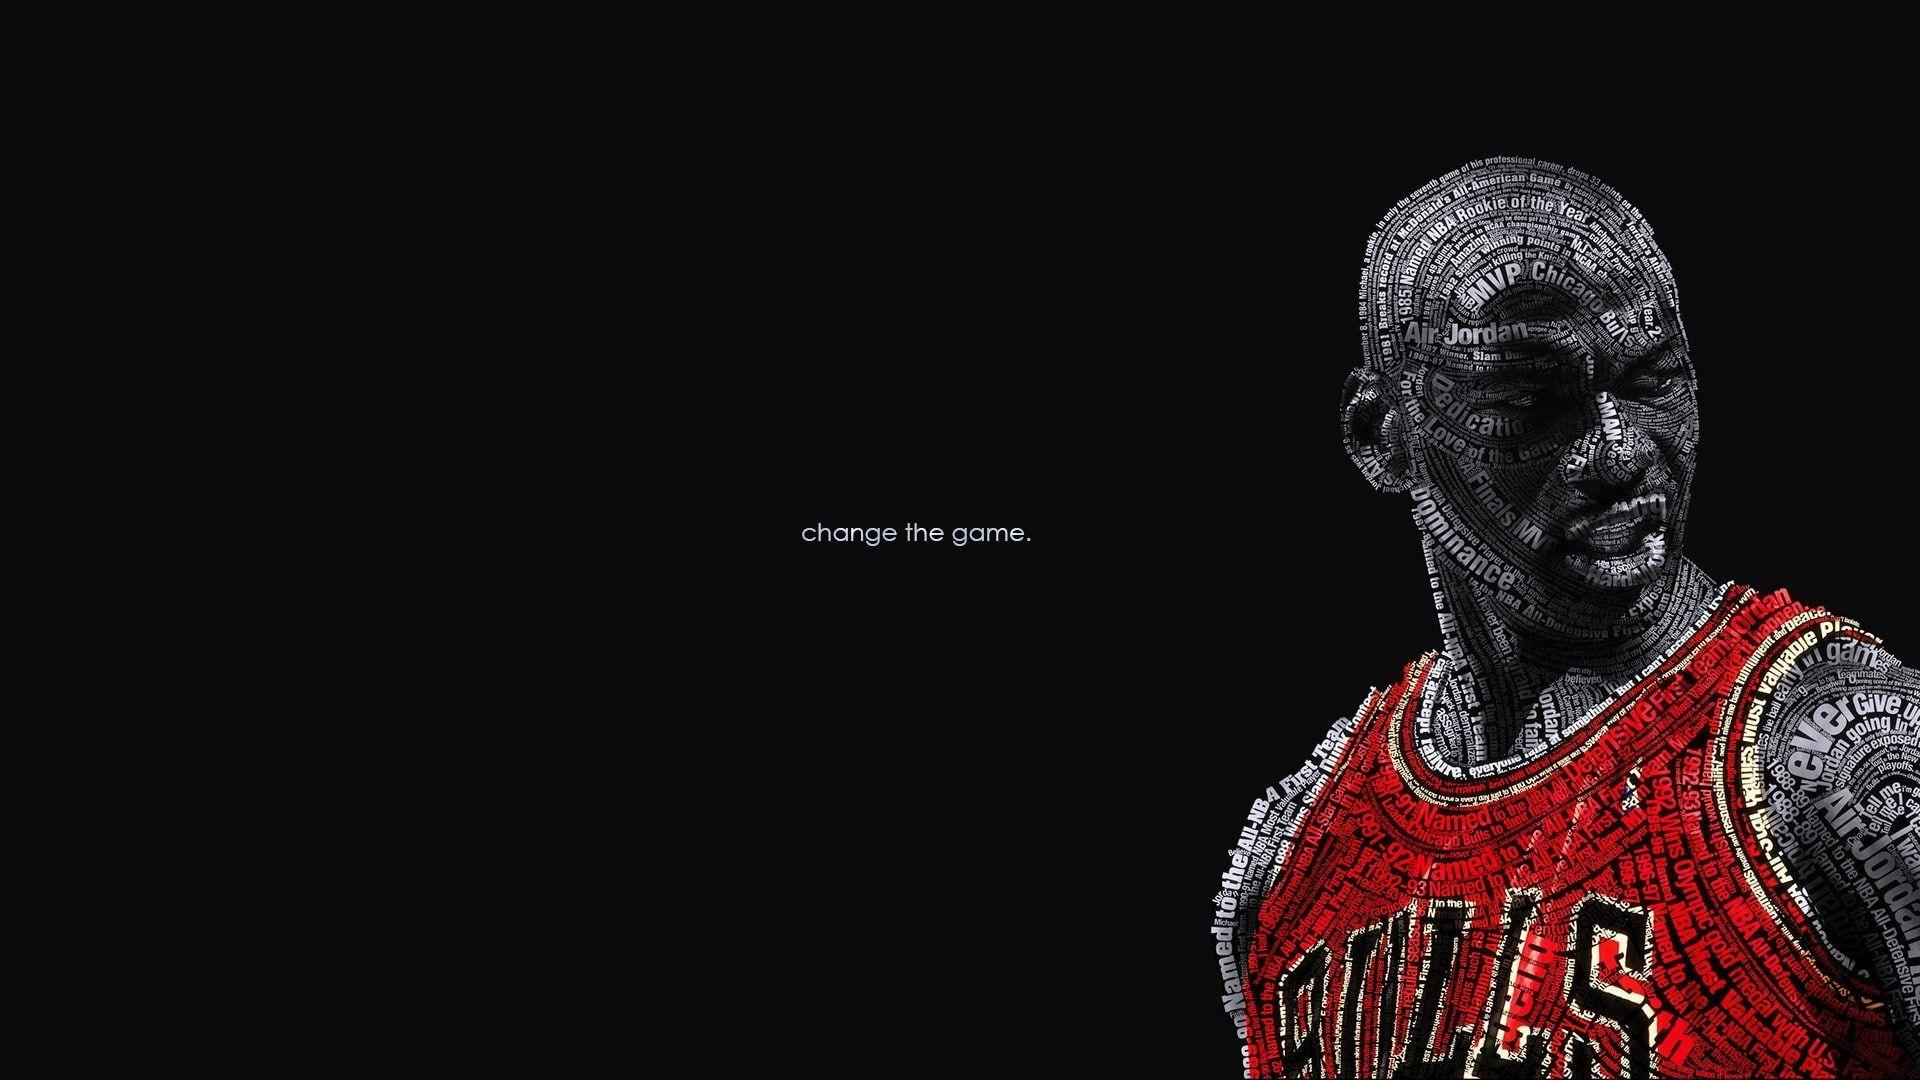 Basketball Desktop Background Pictures 1080p Wallpaper Hdwallpaper Desktop In 2021 Jordan Logo Wallpaper Hypebeast Wallpaper Bulls Wallpaper